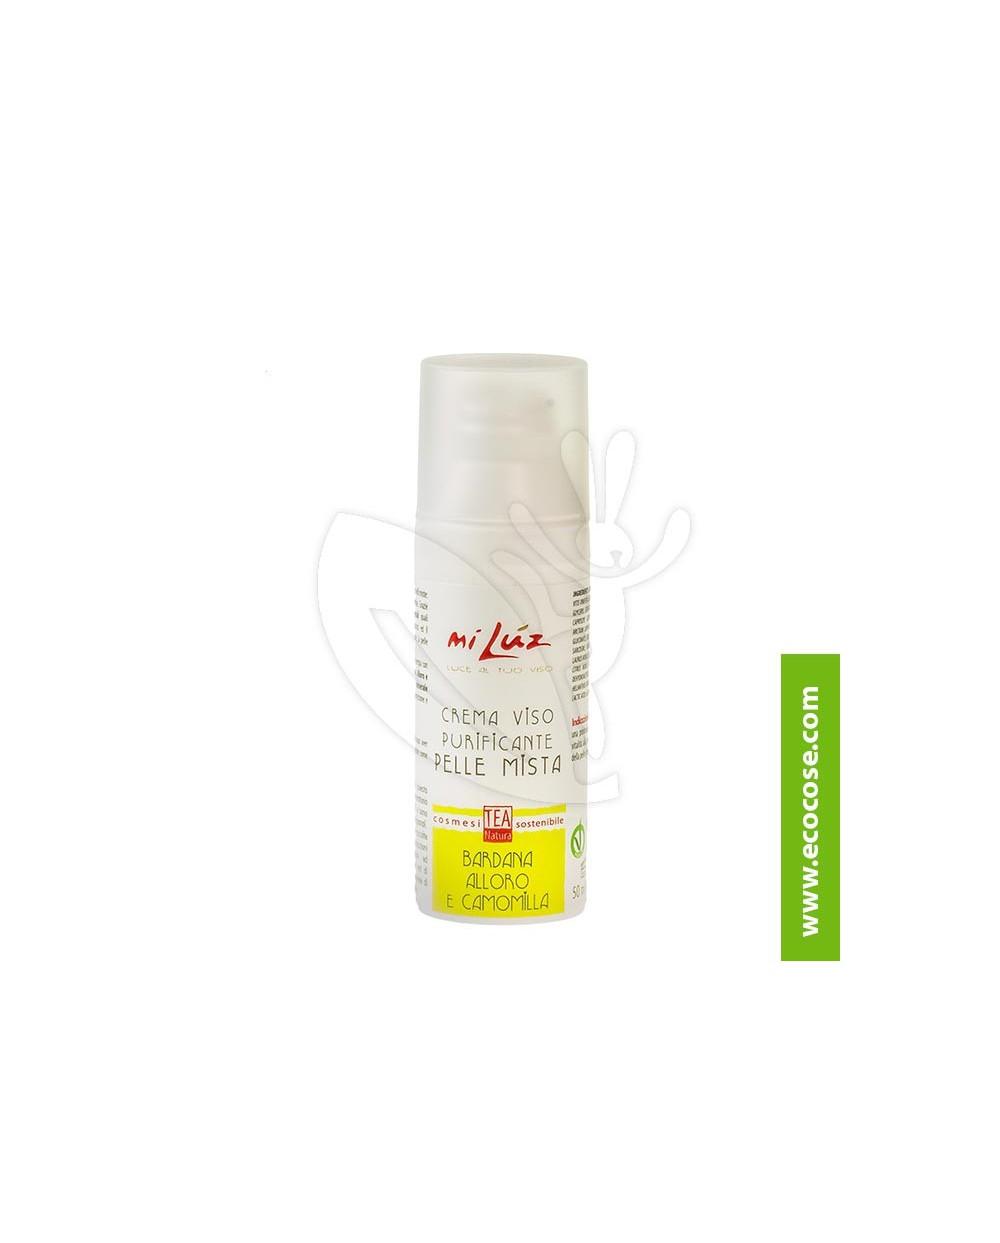 Tea Natura - Mi Lùz Crema viso purificante pelle mista